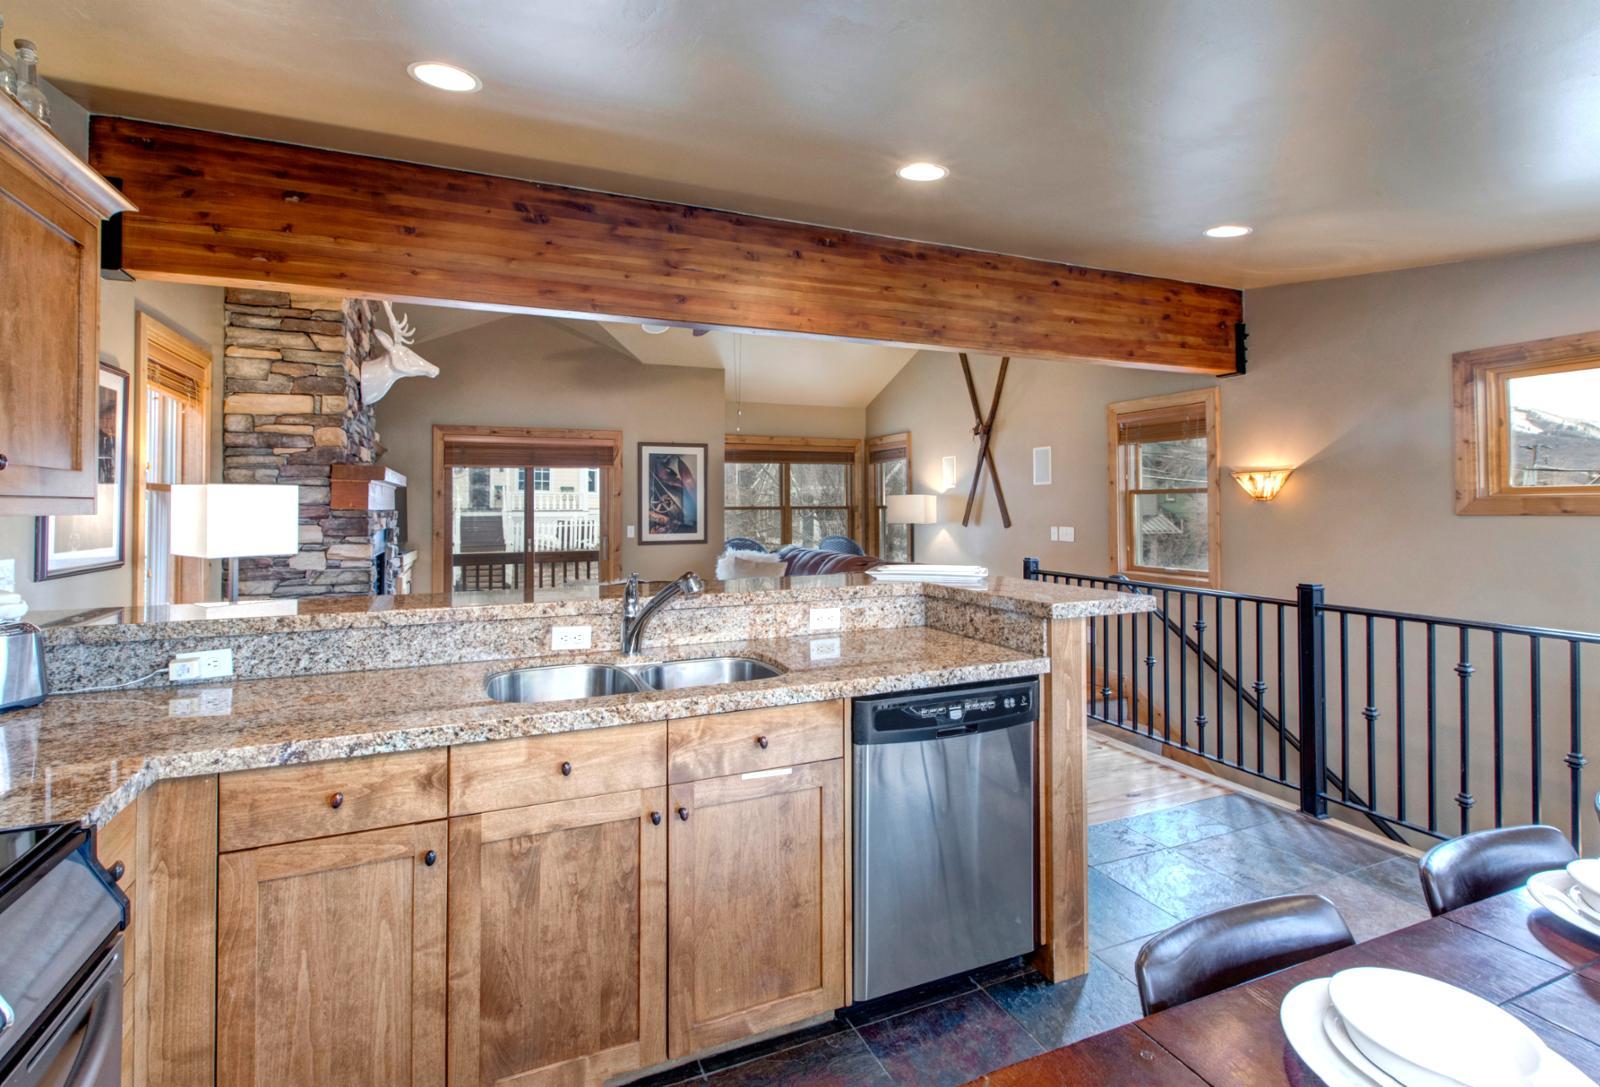 This kitchen awaits you